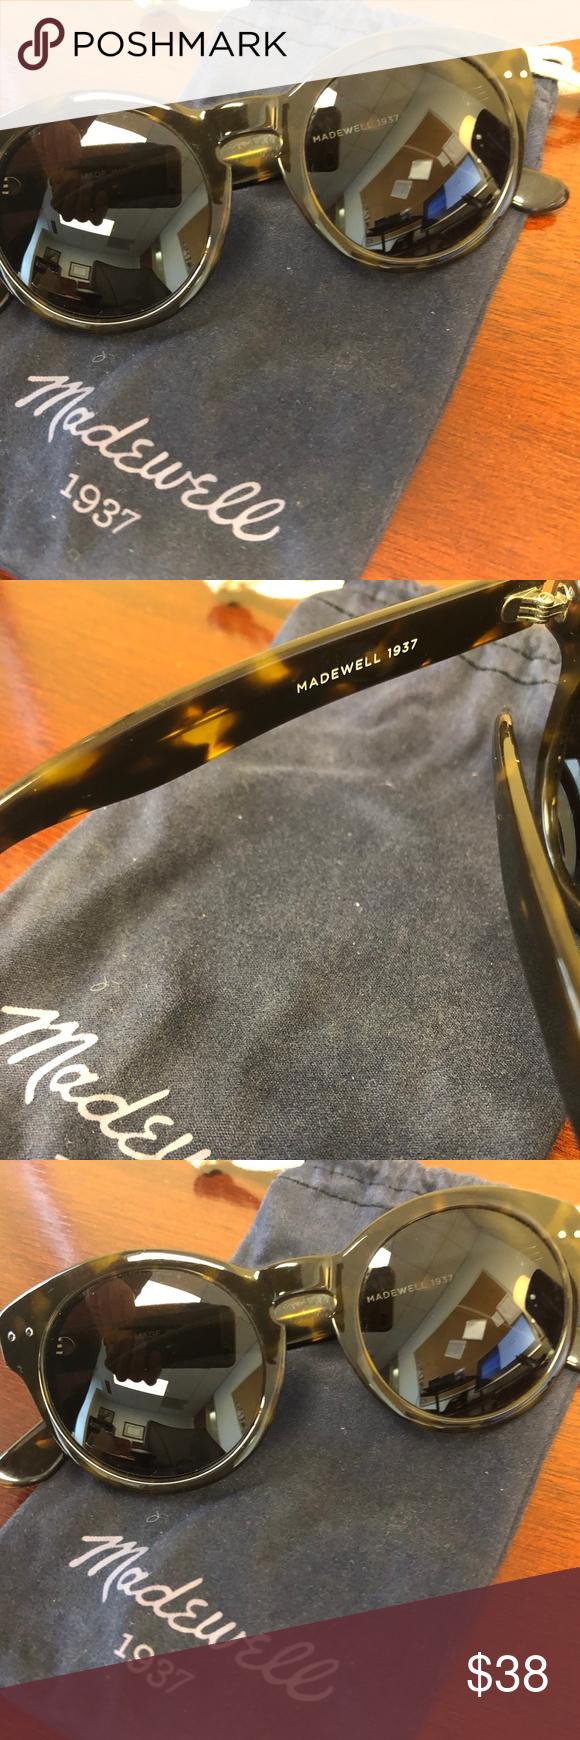 Madewell Sunglasses Madewell sunglasses, Sunglasses